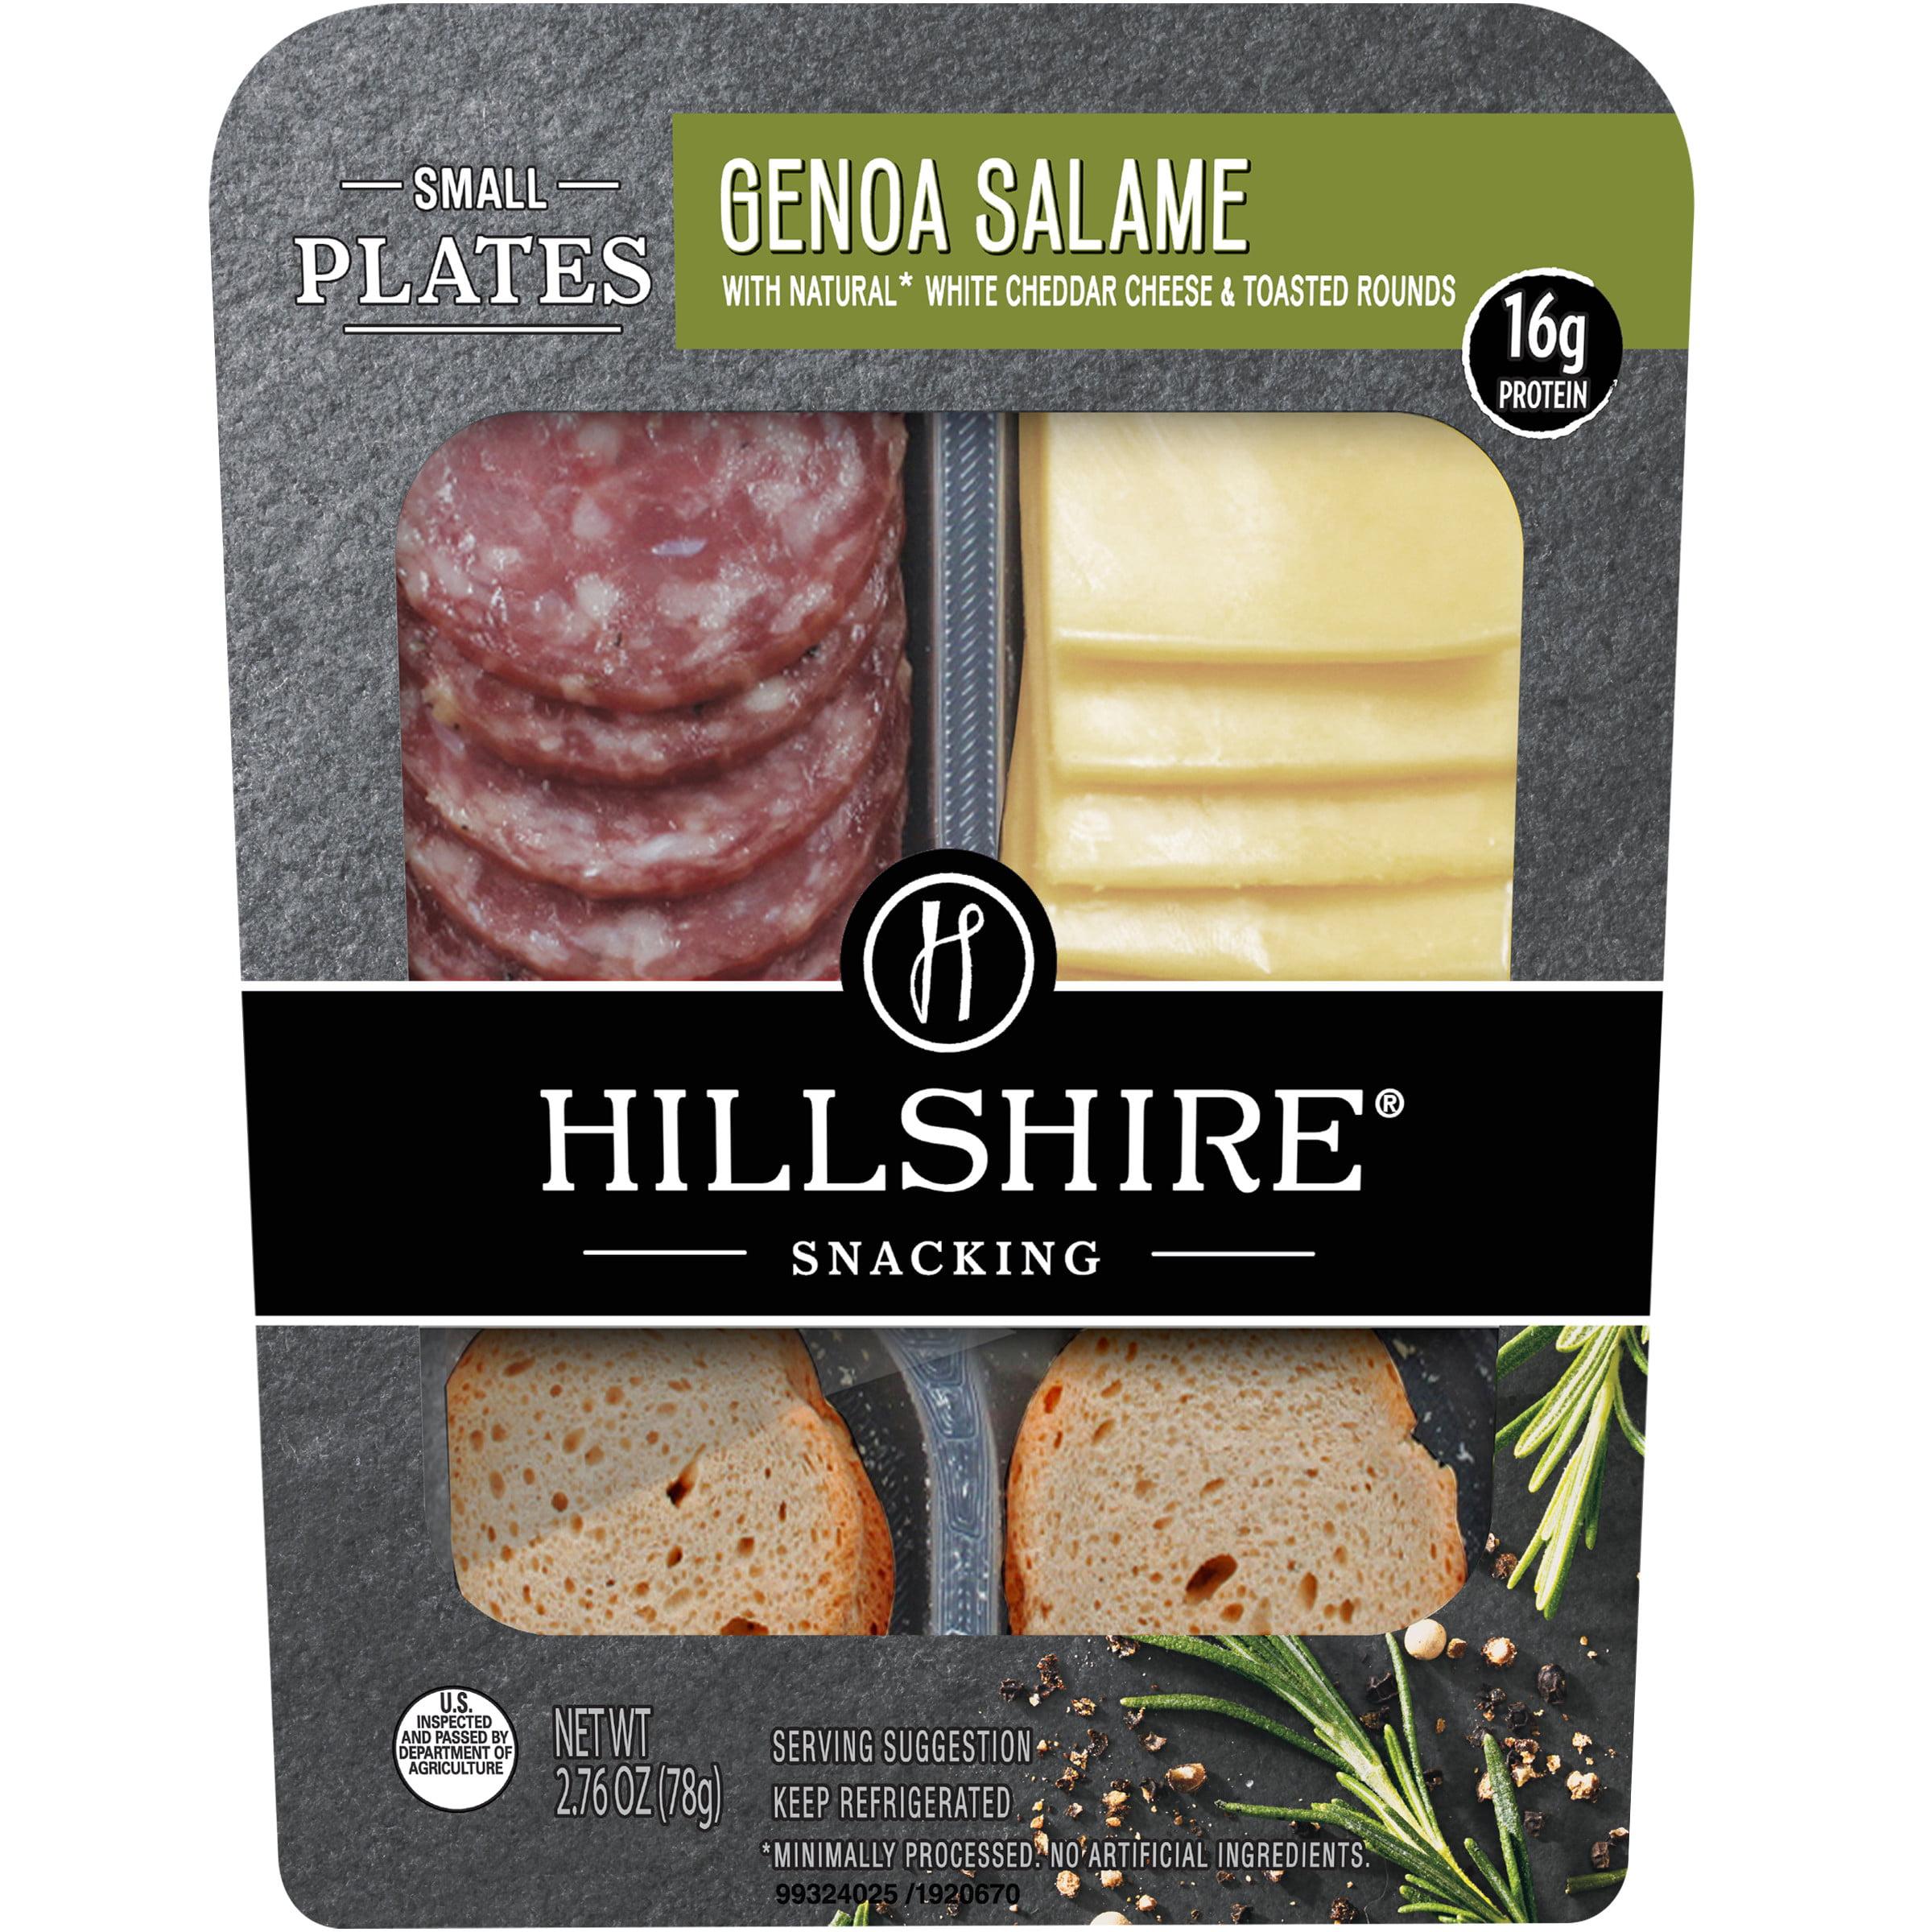 Hillshire Snacking Small Plates Genoa Salami And White Cheddar Cheese Single Serve Walmart Com Walmart Com